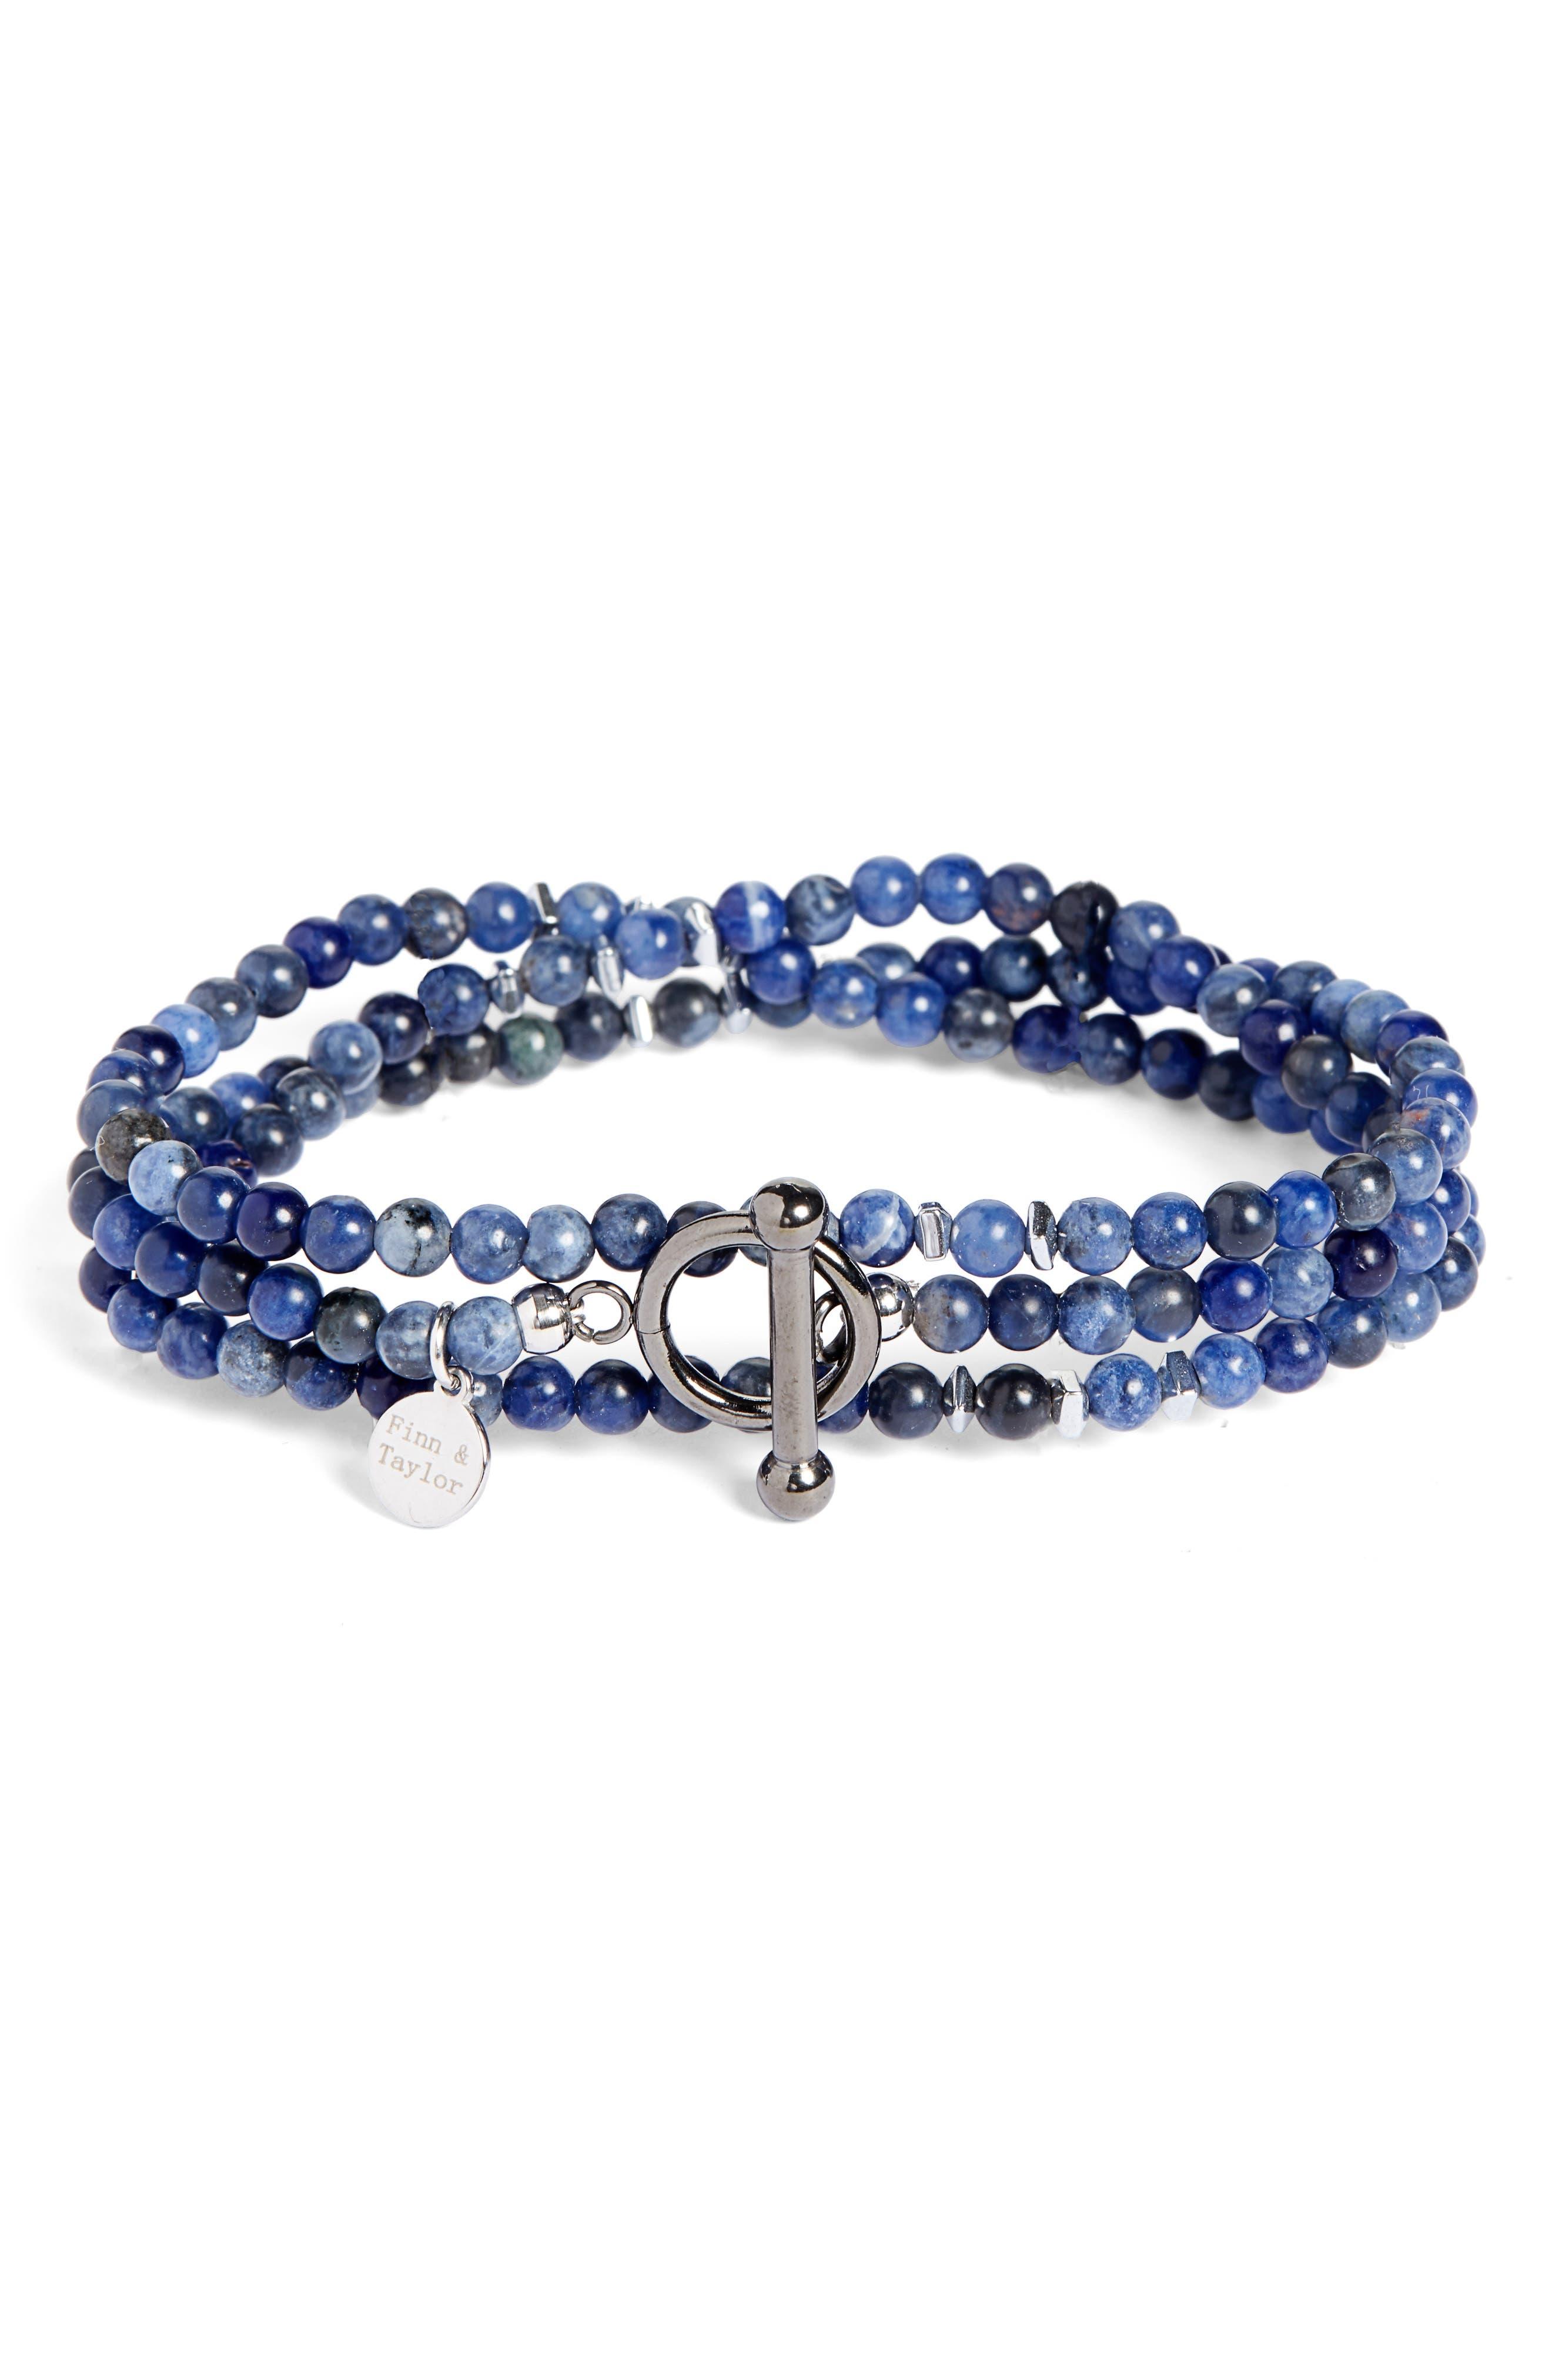 Lapis Lazuli Bead Wrap Bracelet,                             Main thumbnail 1, color,                             BLUE